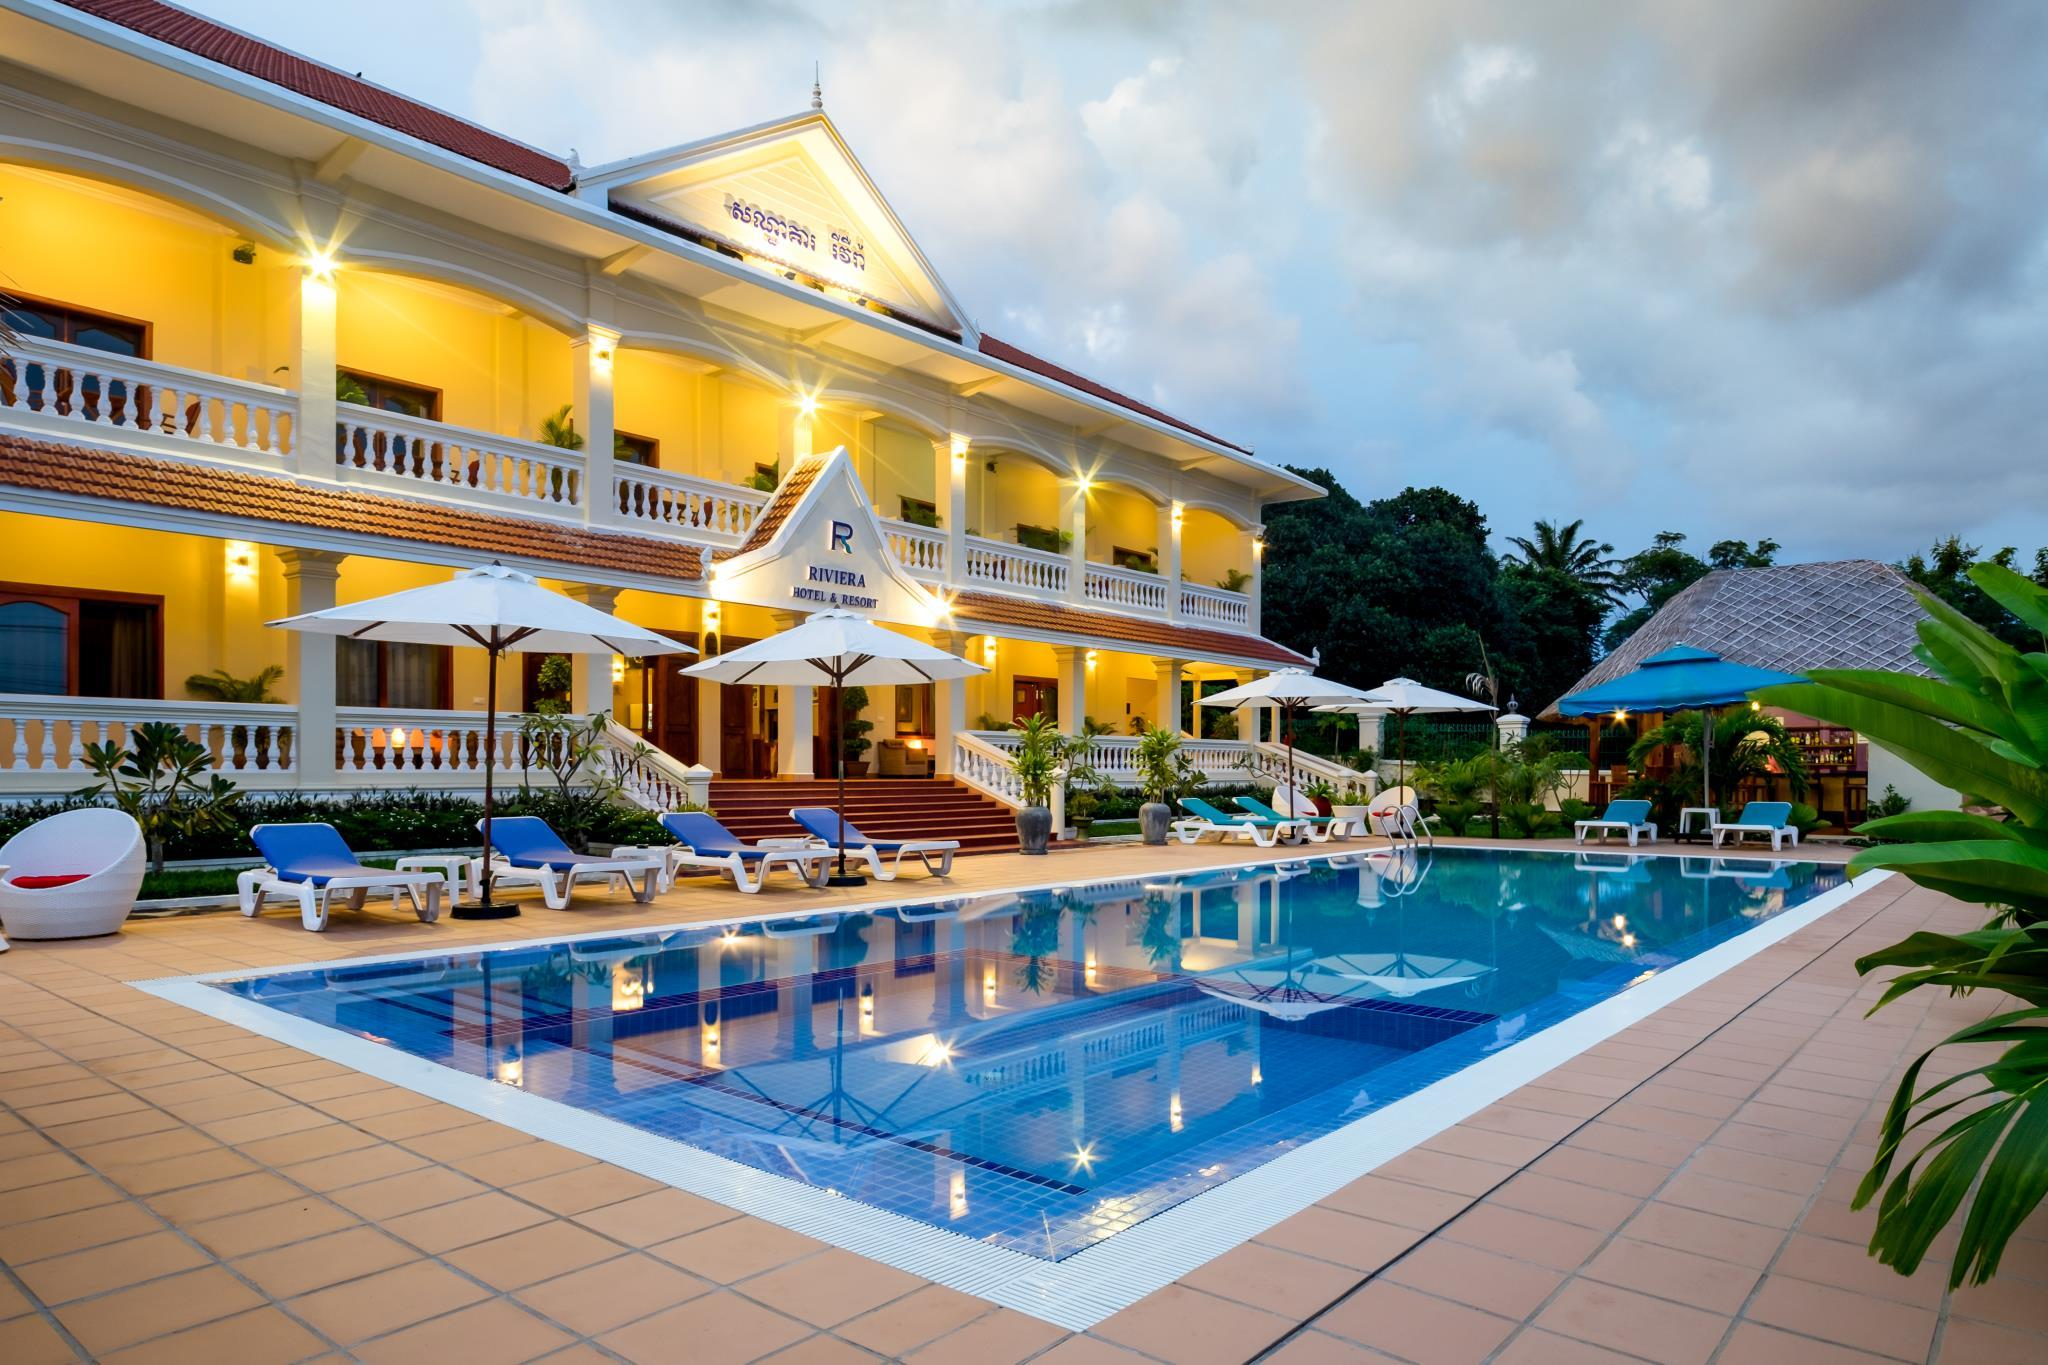 Riviera Hotel And Resort Kep